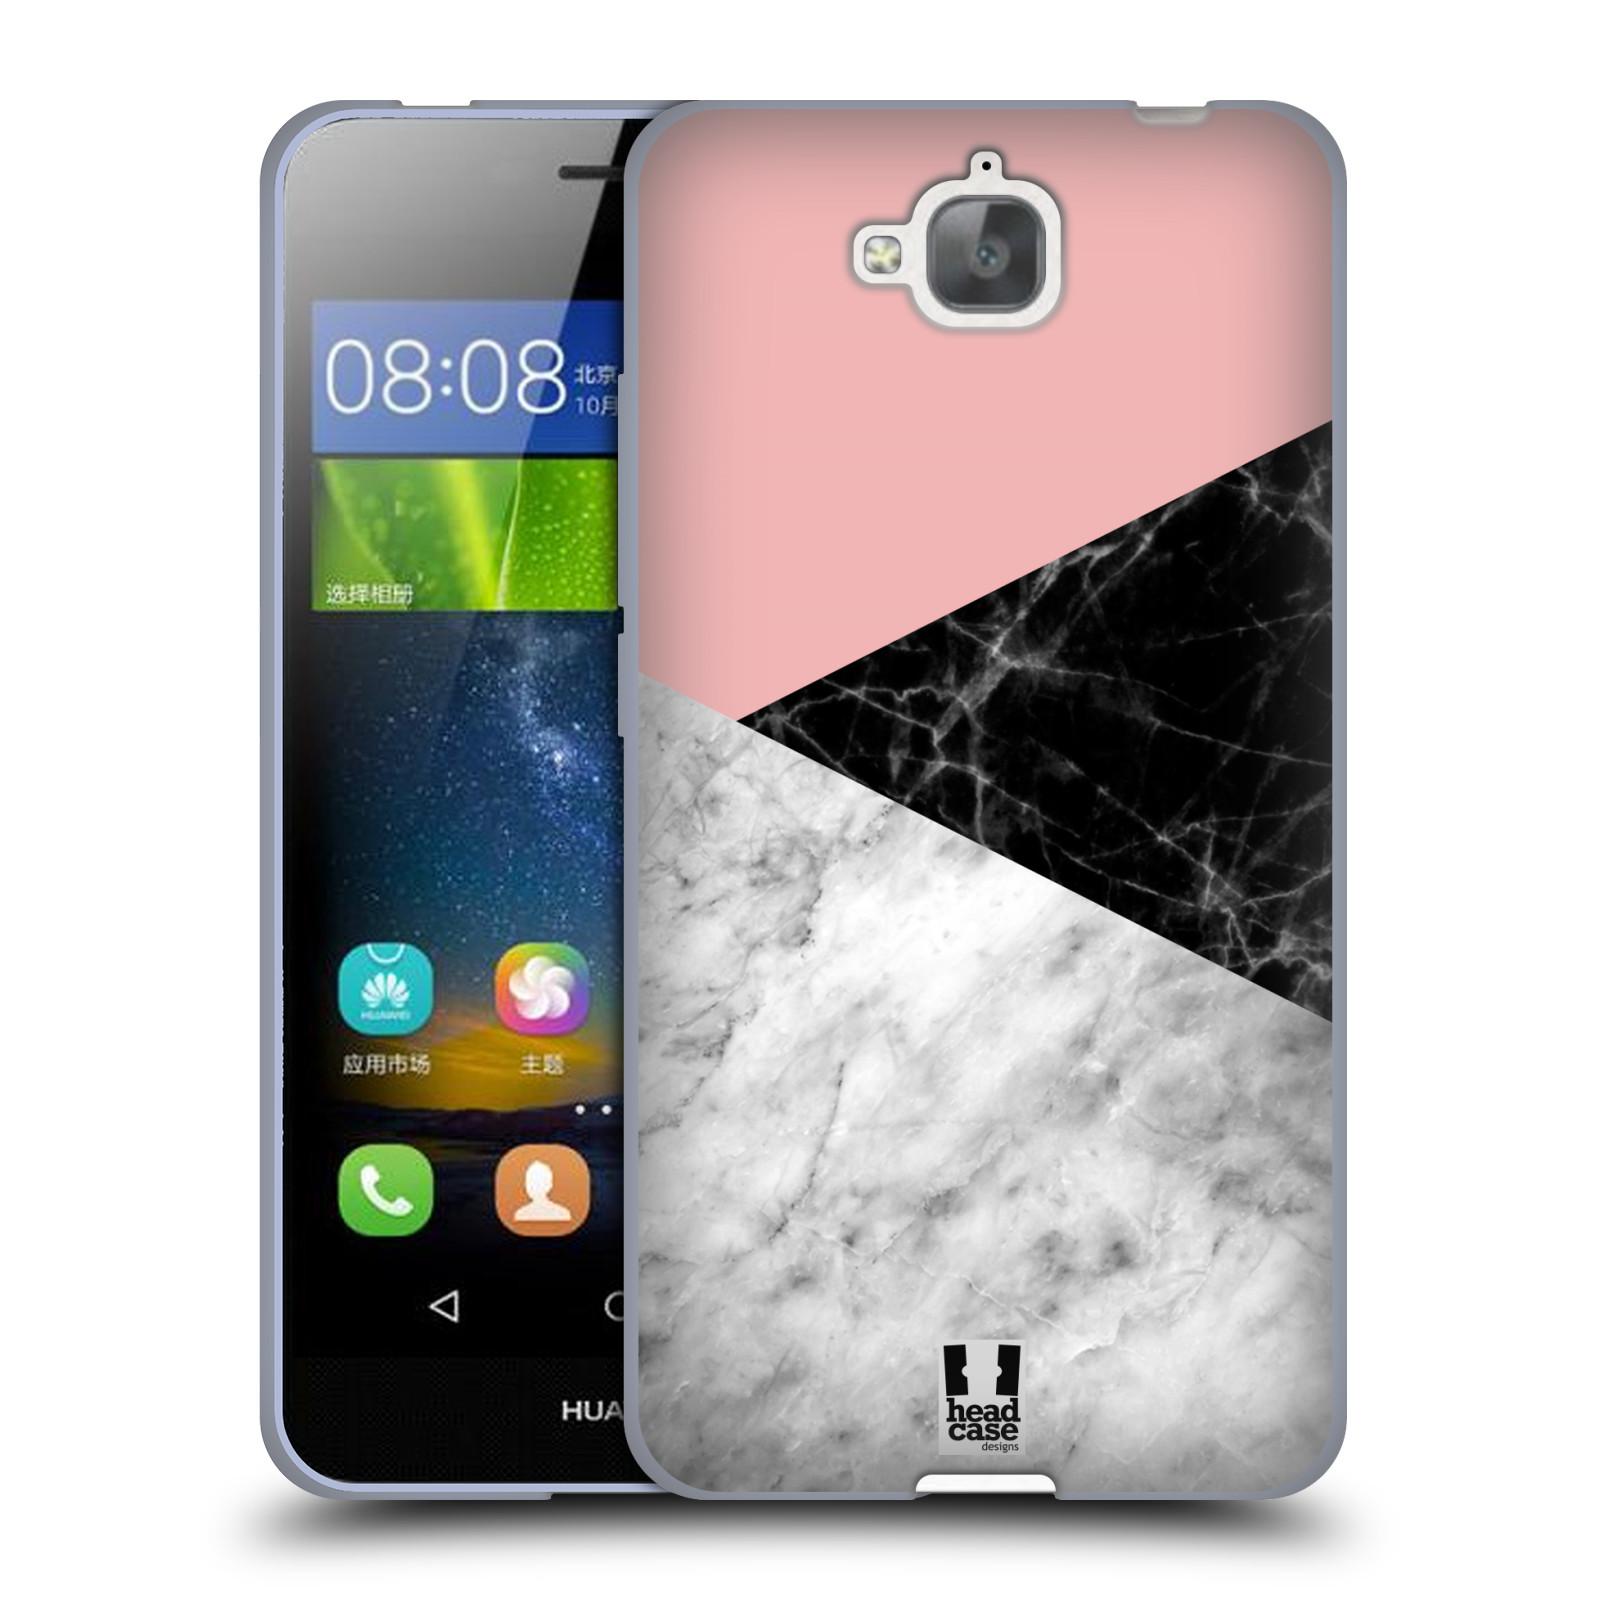 Silikonové pouzdro na mobil Huawei Y6 Pro Dual Sim - Head Case - Mramor mix